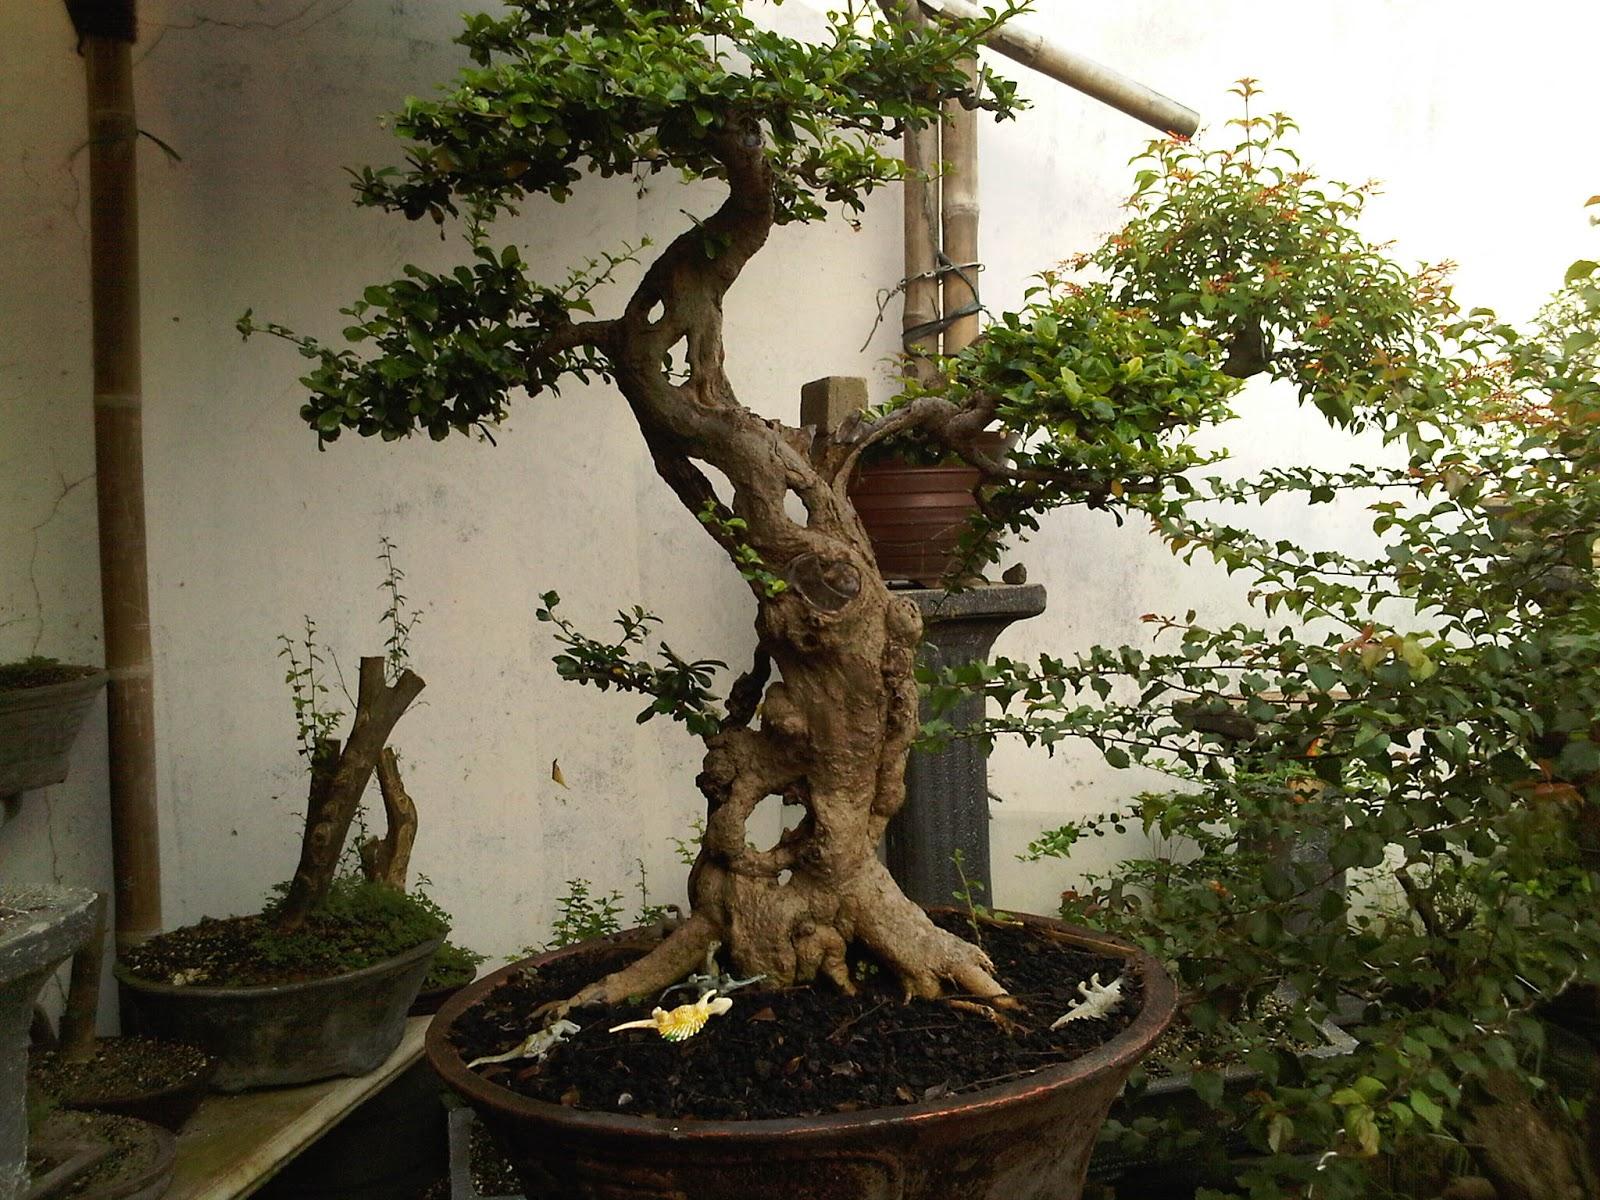 bonsai carmona Download bwin bwin premium poker app App mobilebwin microphylla